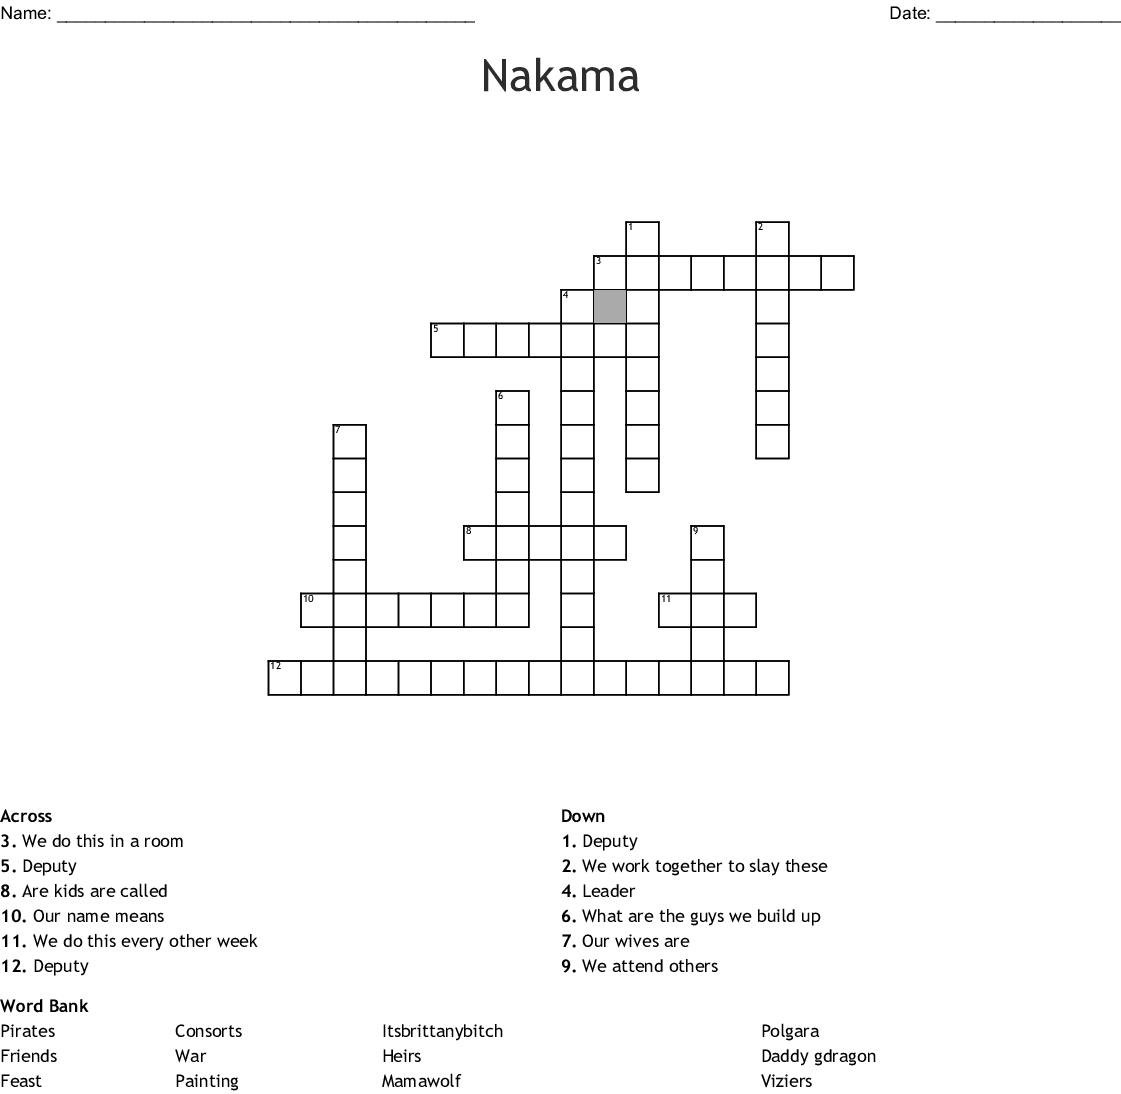 Nakama Crossword